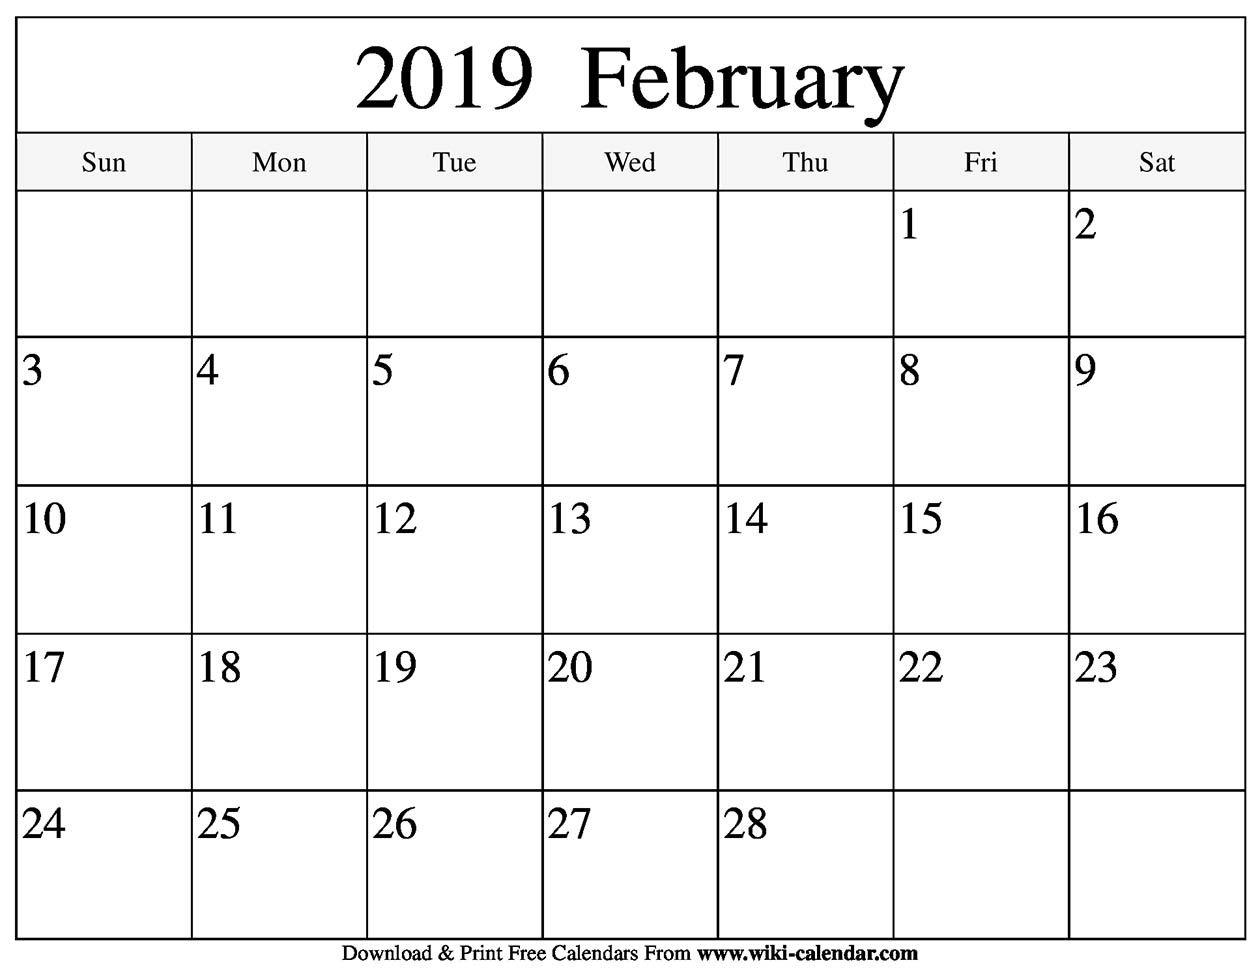 List Calendar For February 2019 February 2019 Blank February 2019 Calendar #February2019Calendar